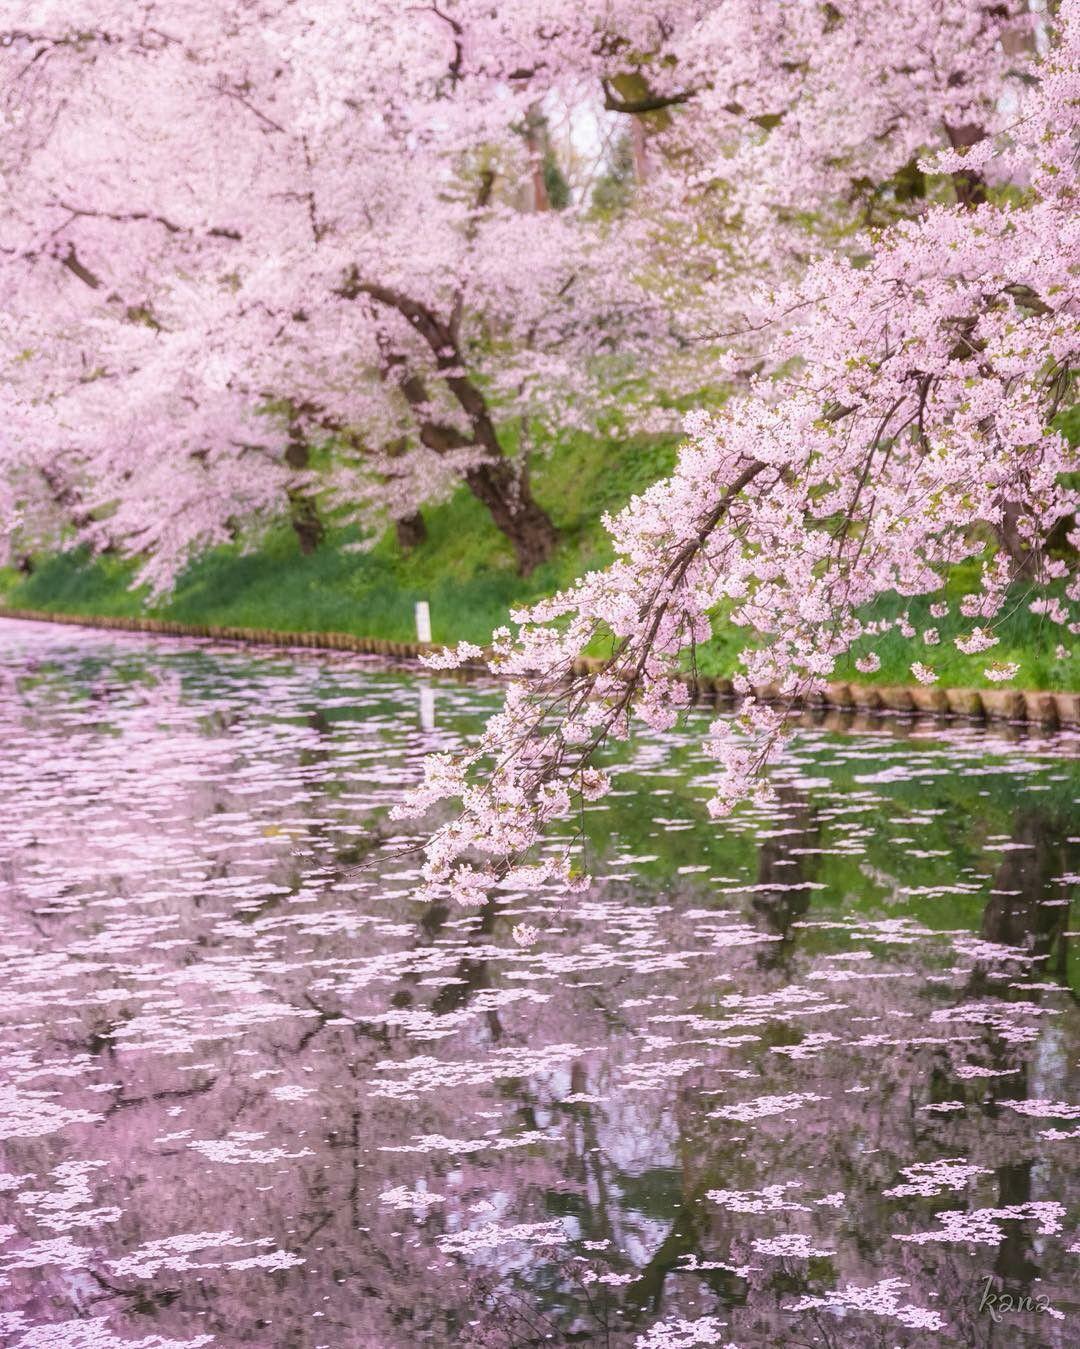 Japan Sakura Blossom Trees Scenery Sakura Cherry Blossom